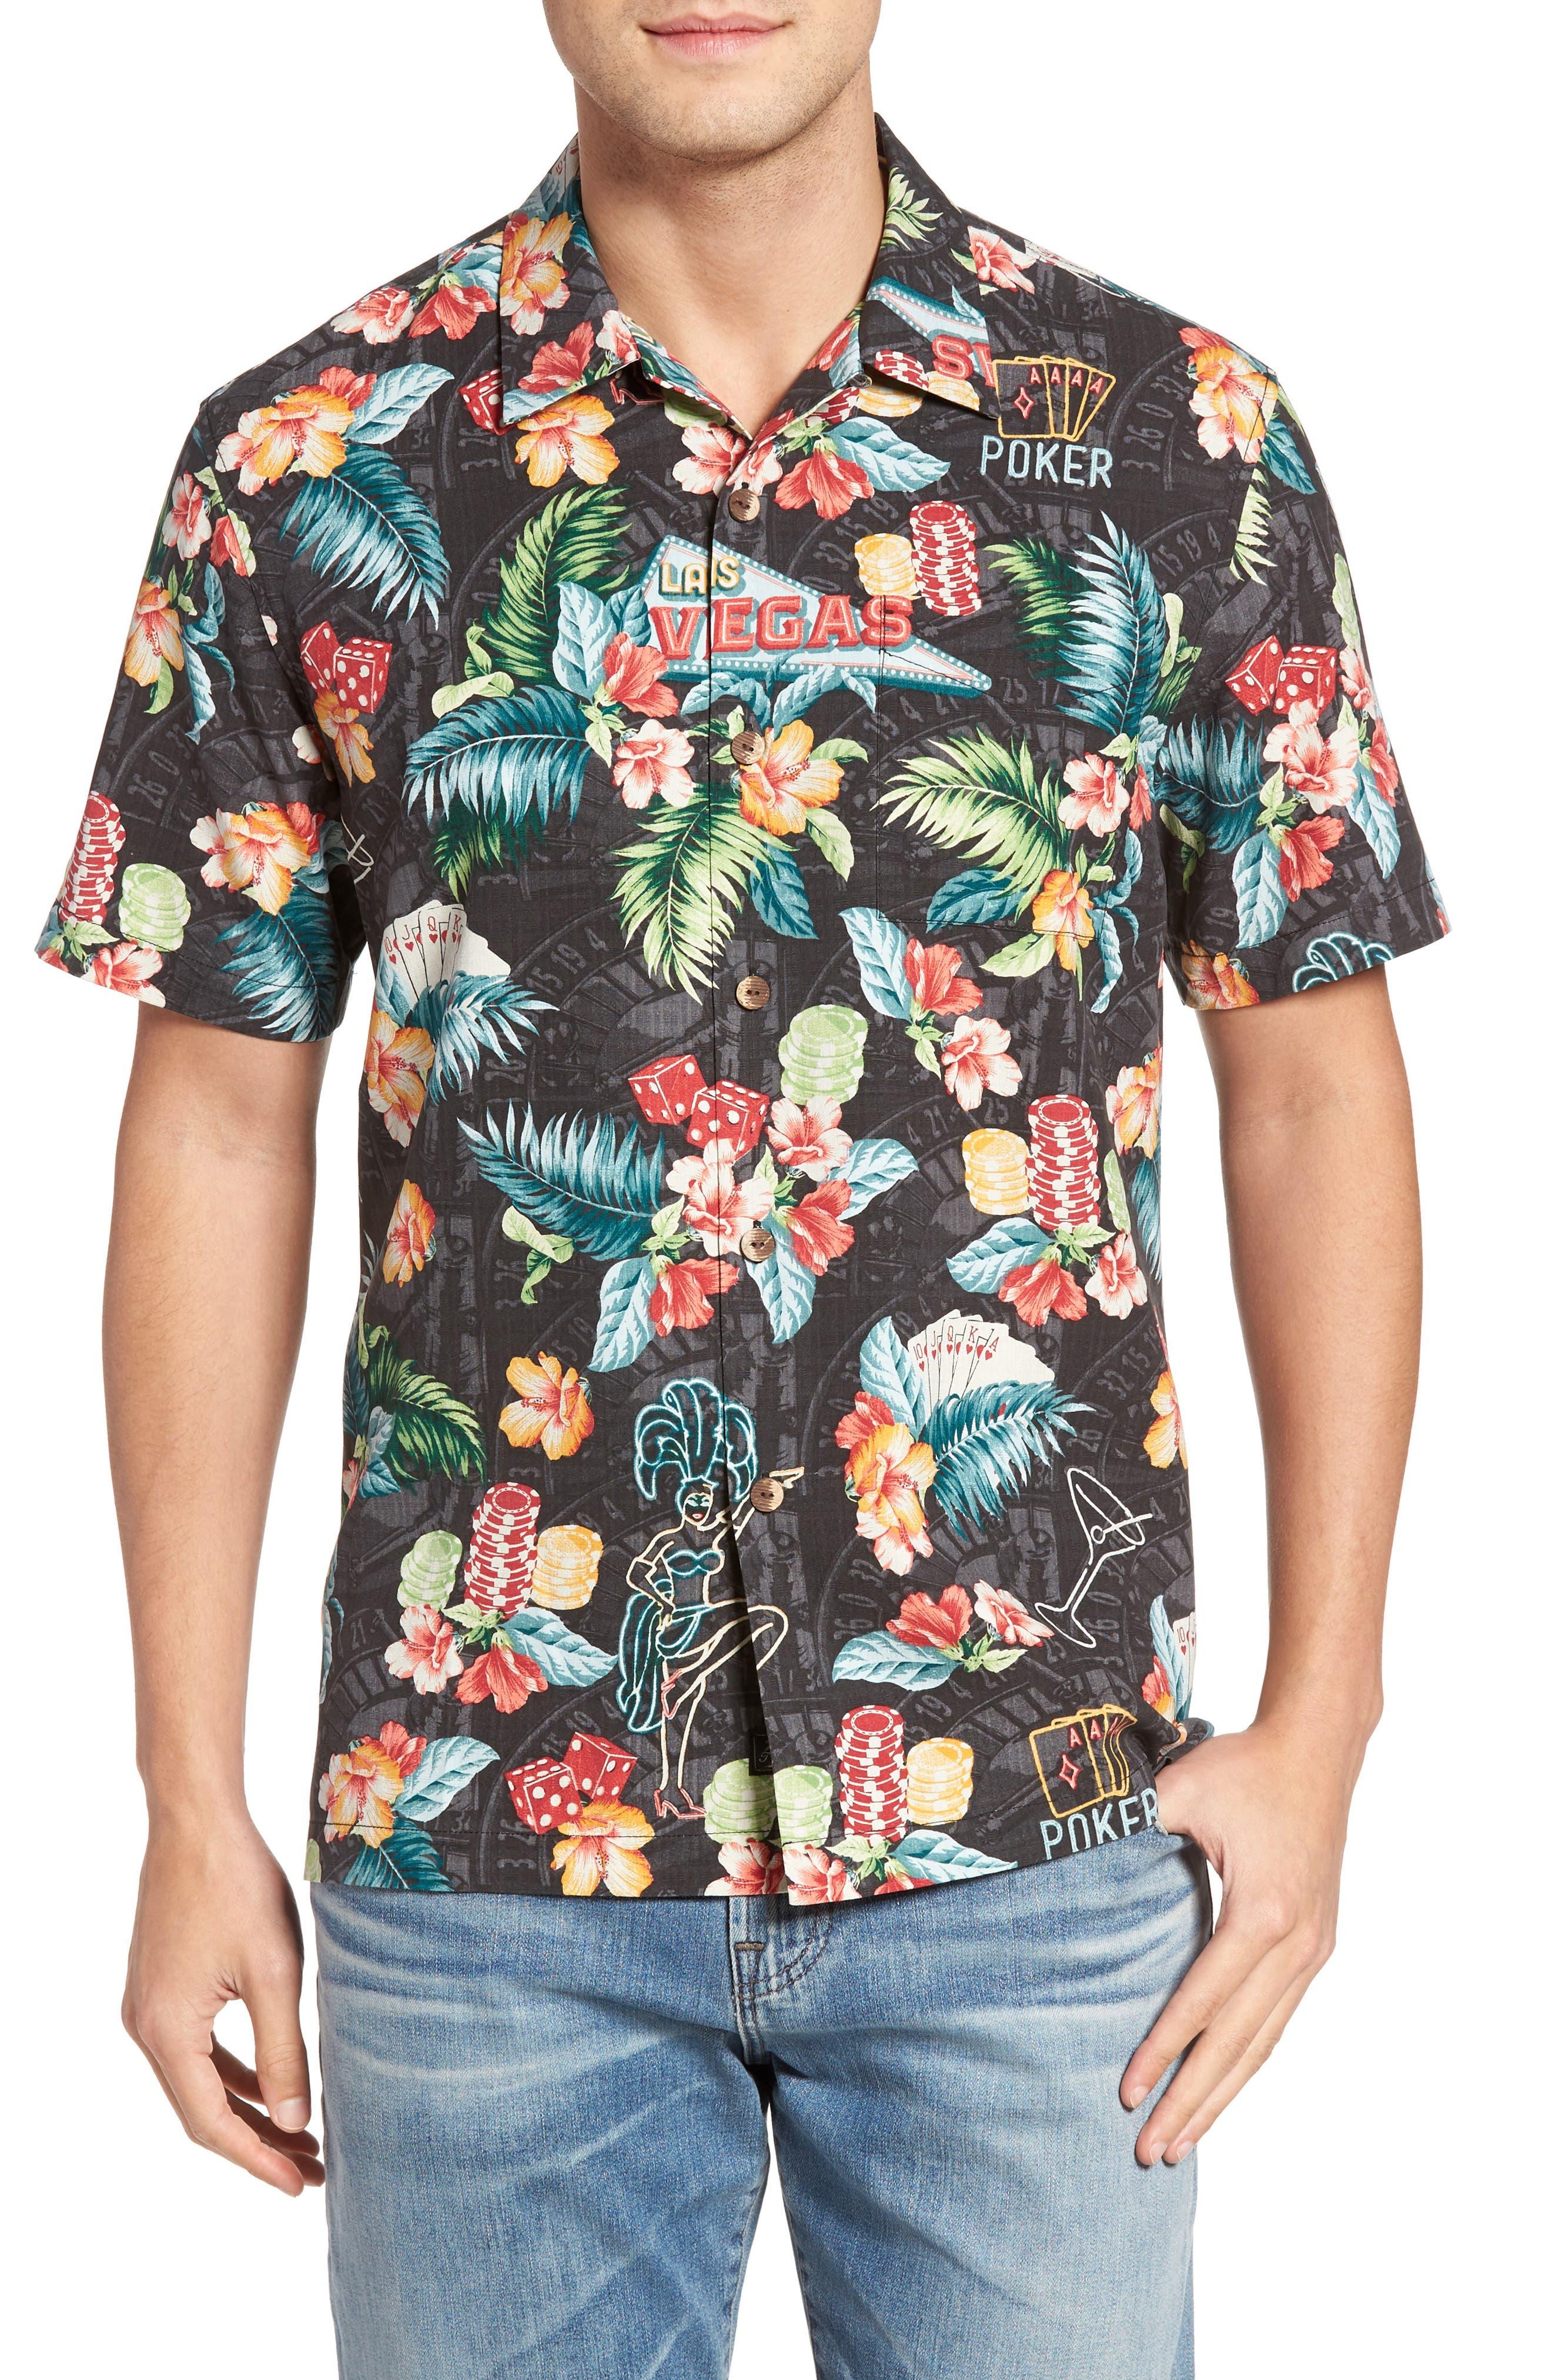 Tommy Bahama Poker Days Silk Camp Shirt (Big & Tall)